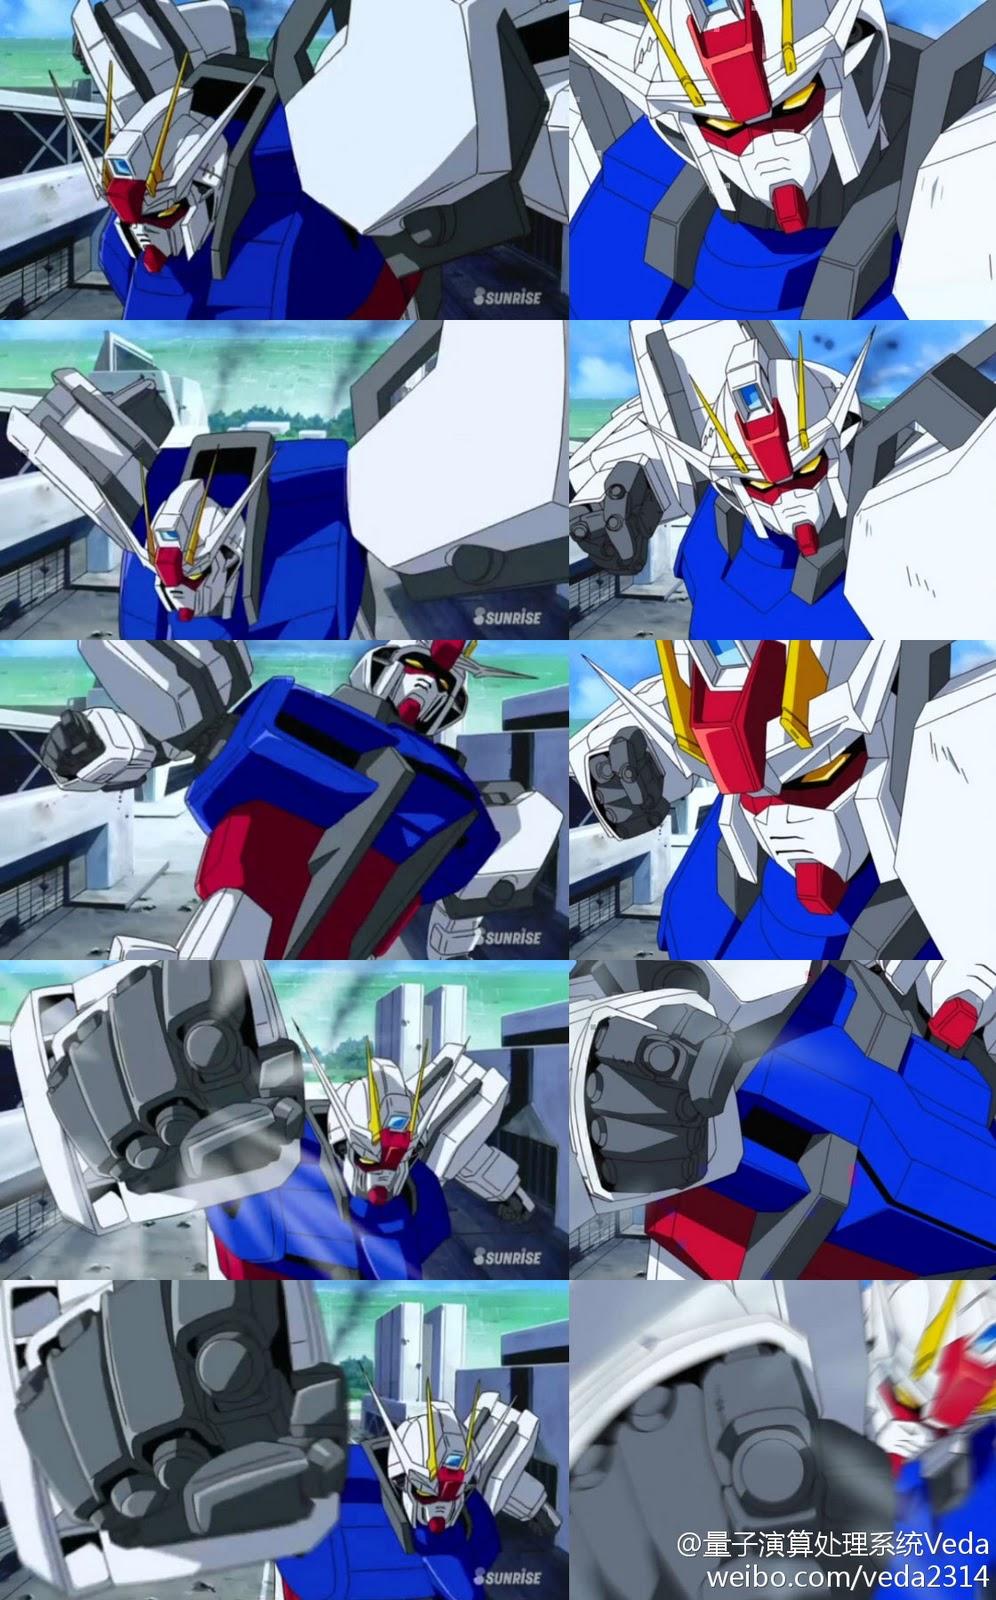 Cool Zeta Gundam Hd Remaster Wallpapers 4